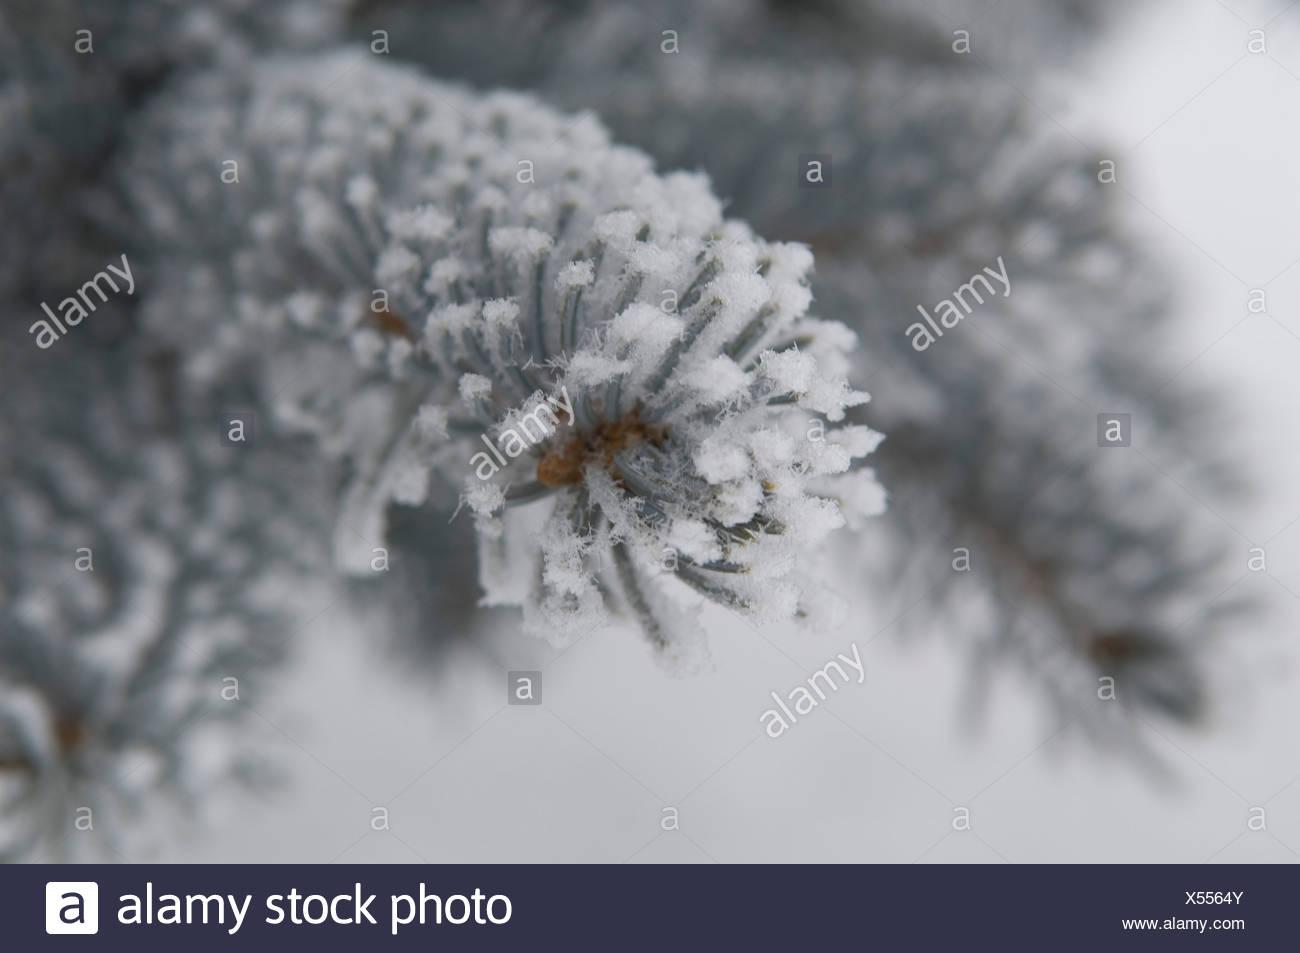 Germany, Swabian Alps, View of pine tree branch in frosty winter - Stock Image